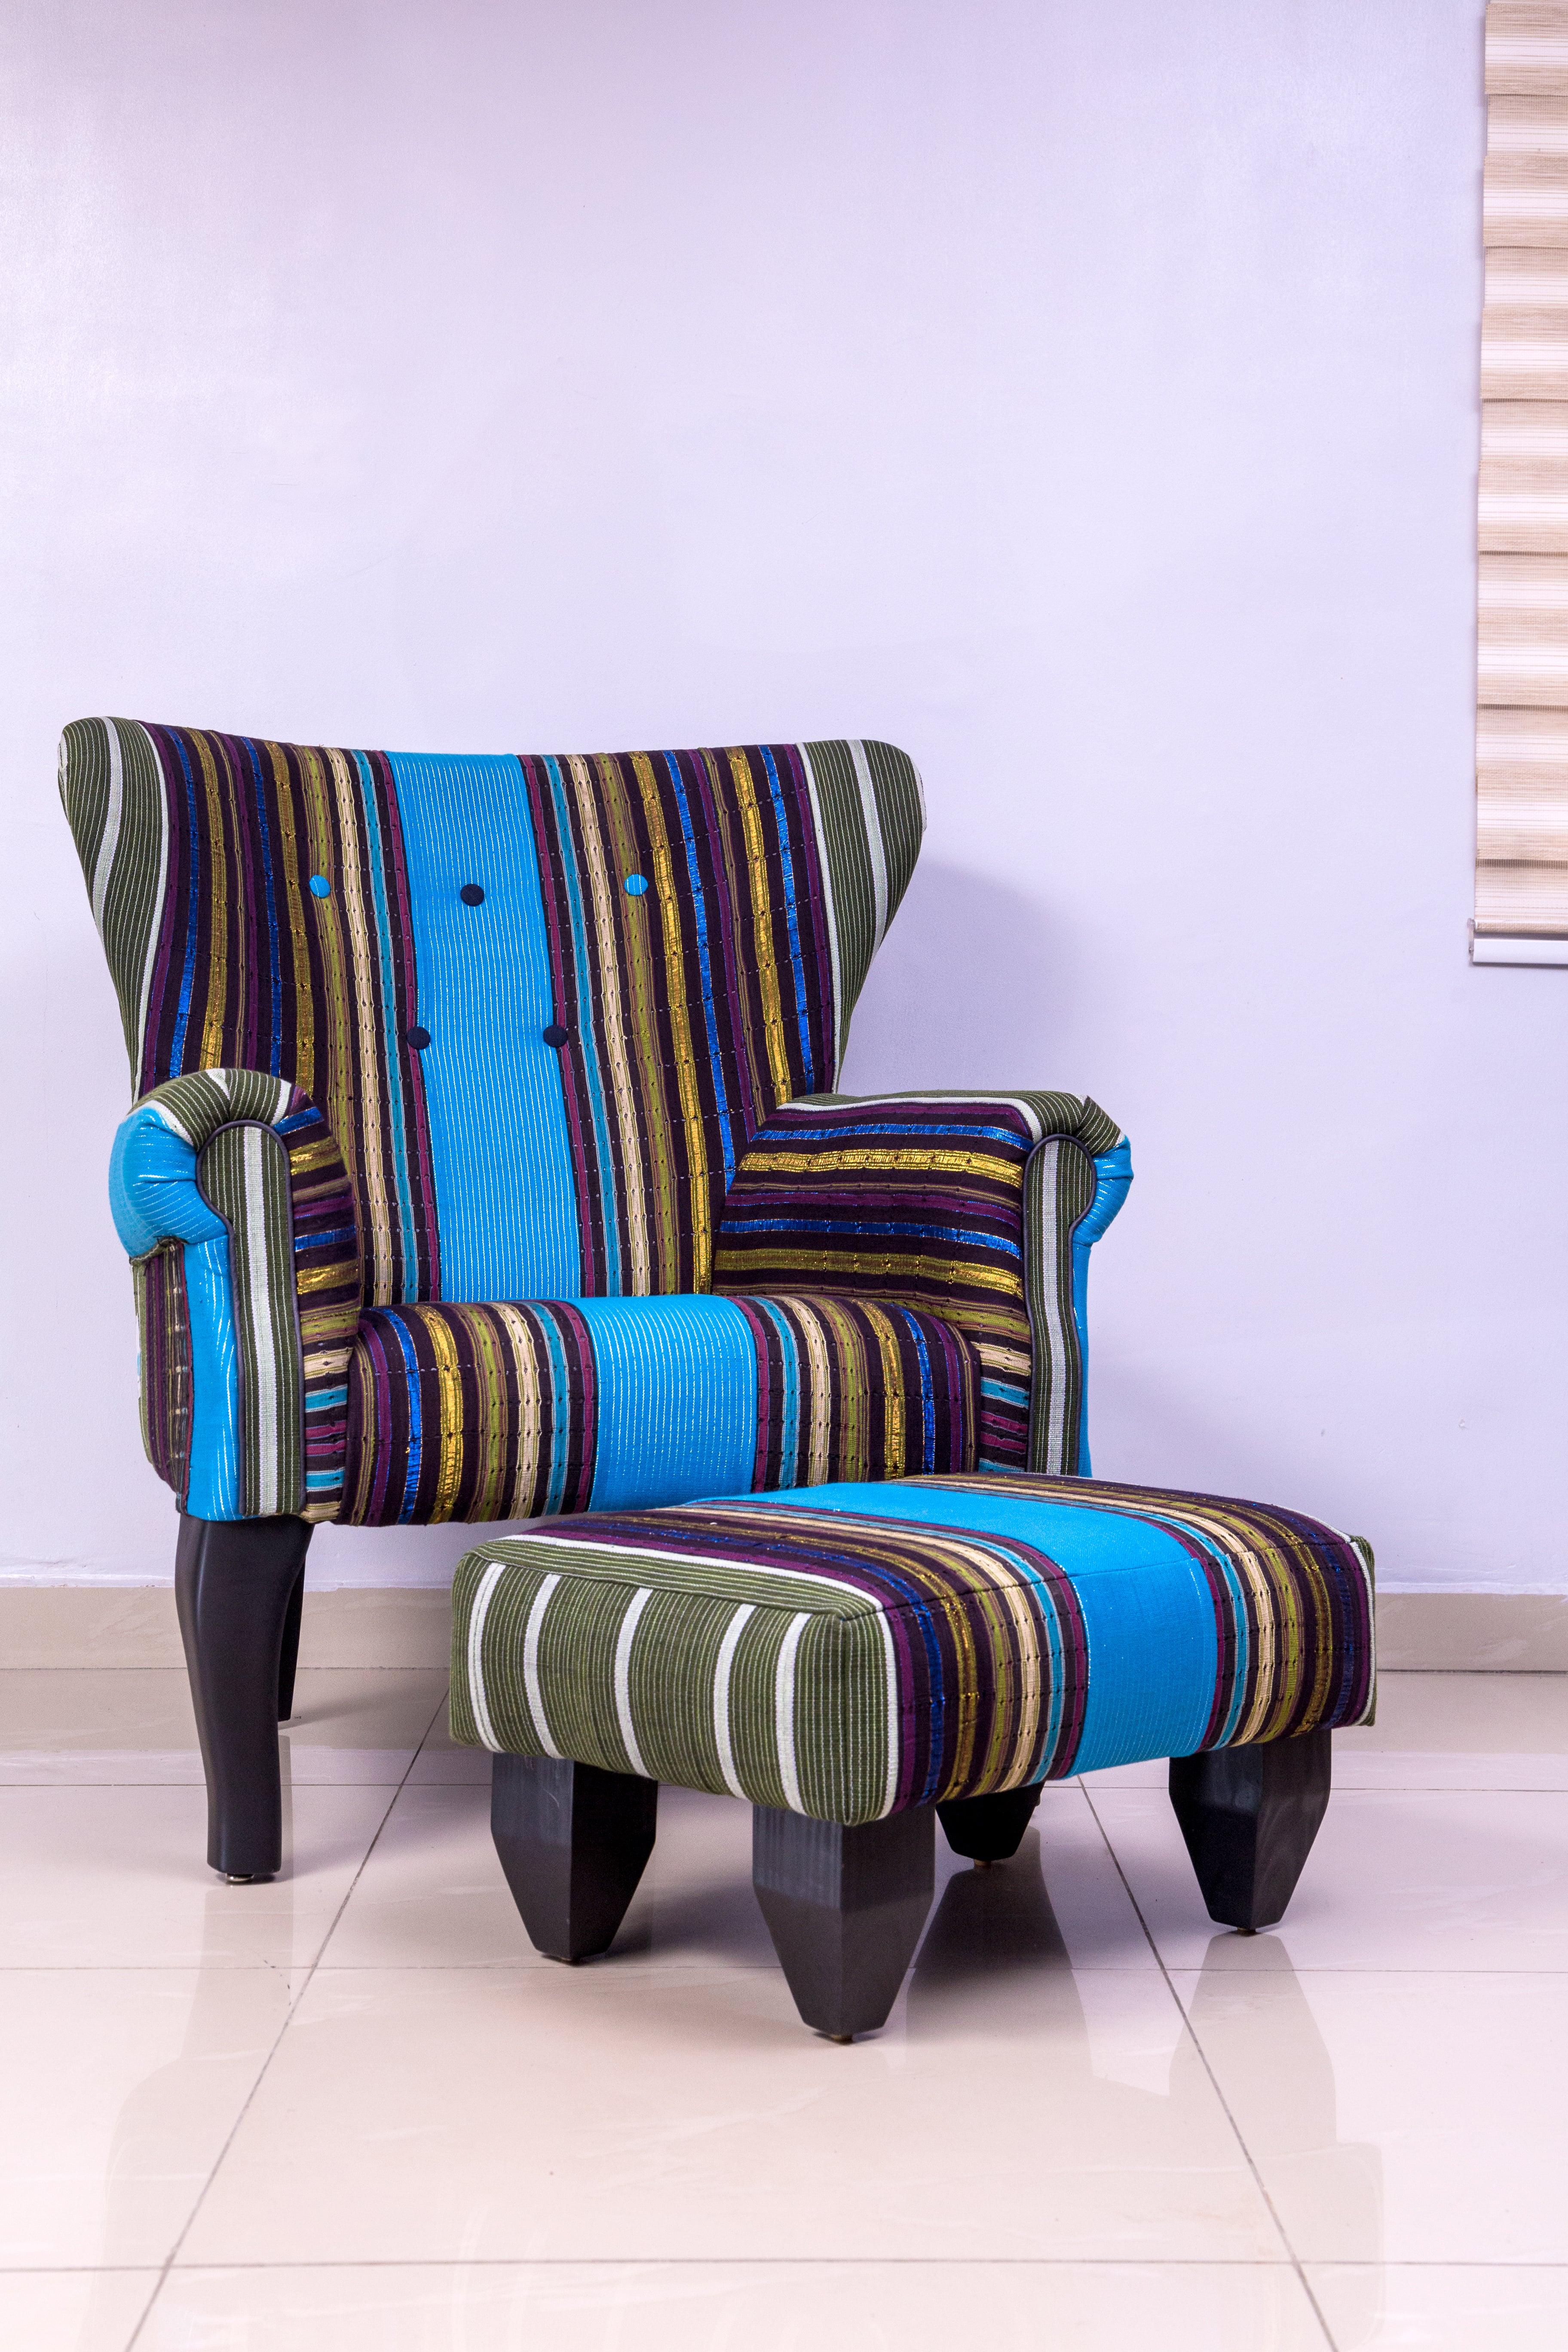 Tunu Okun Chair by Ile.Ila (House of Lines)